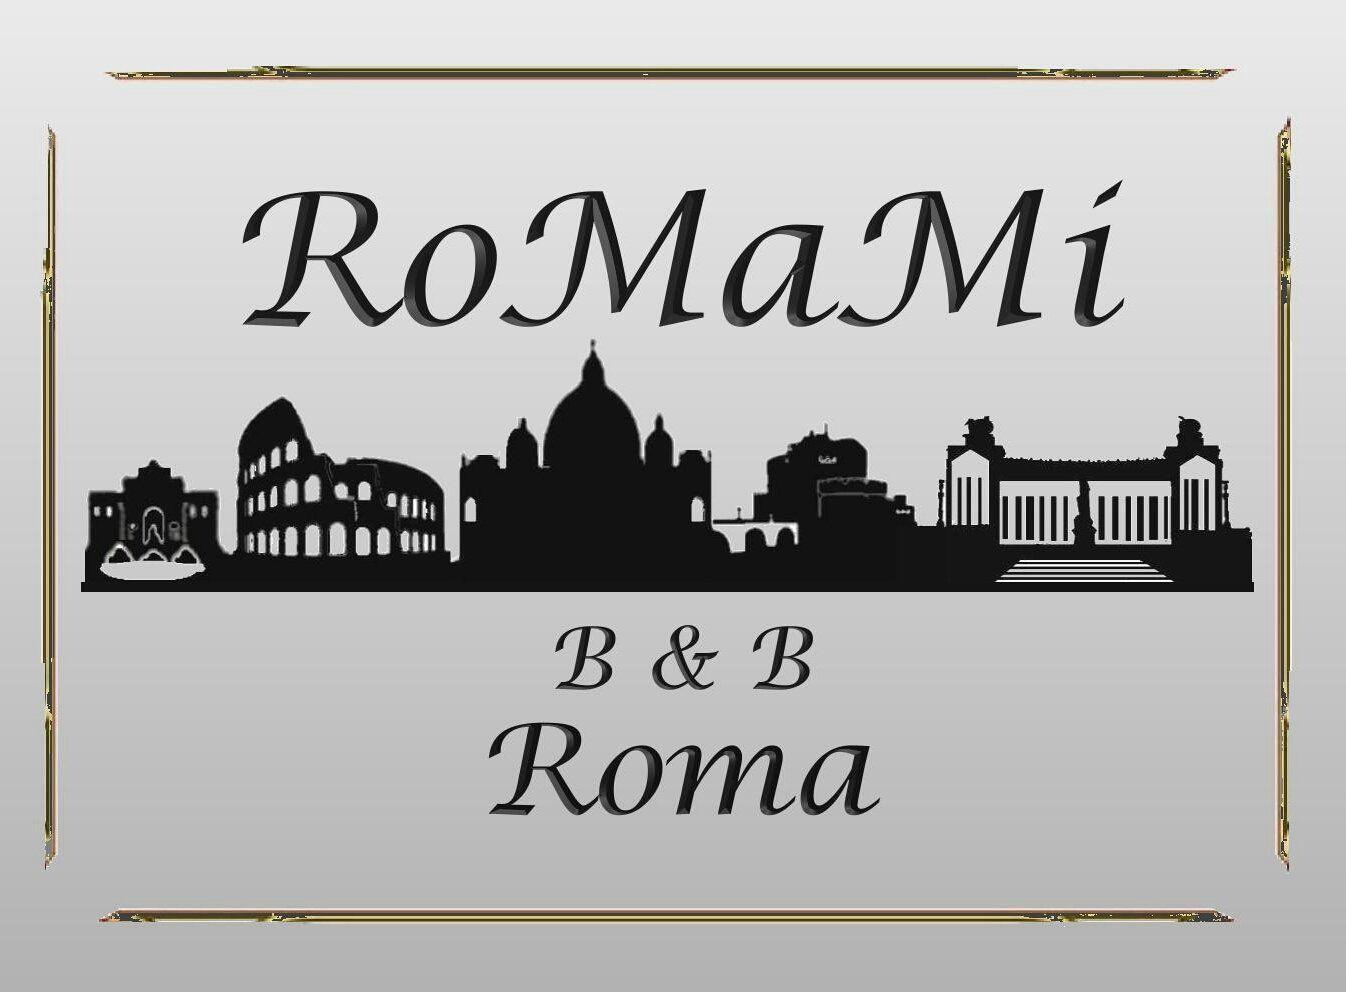 Romami